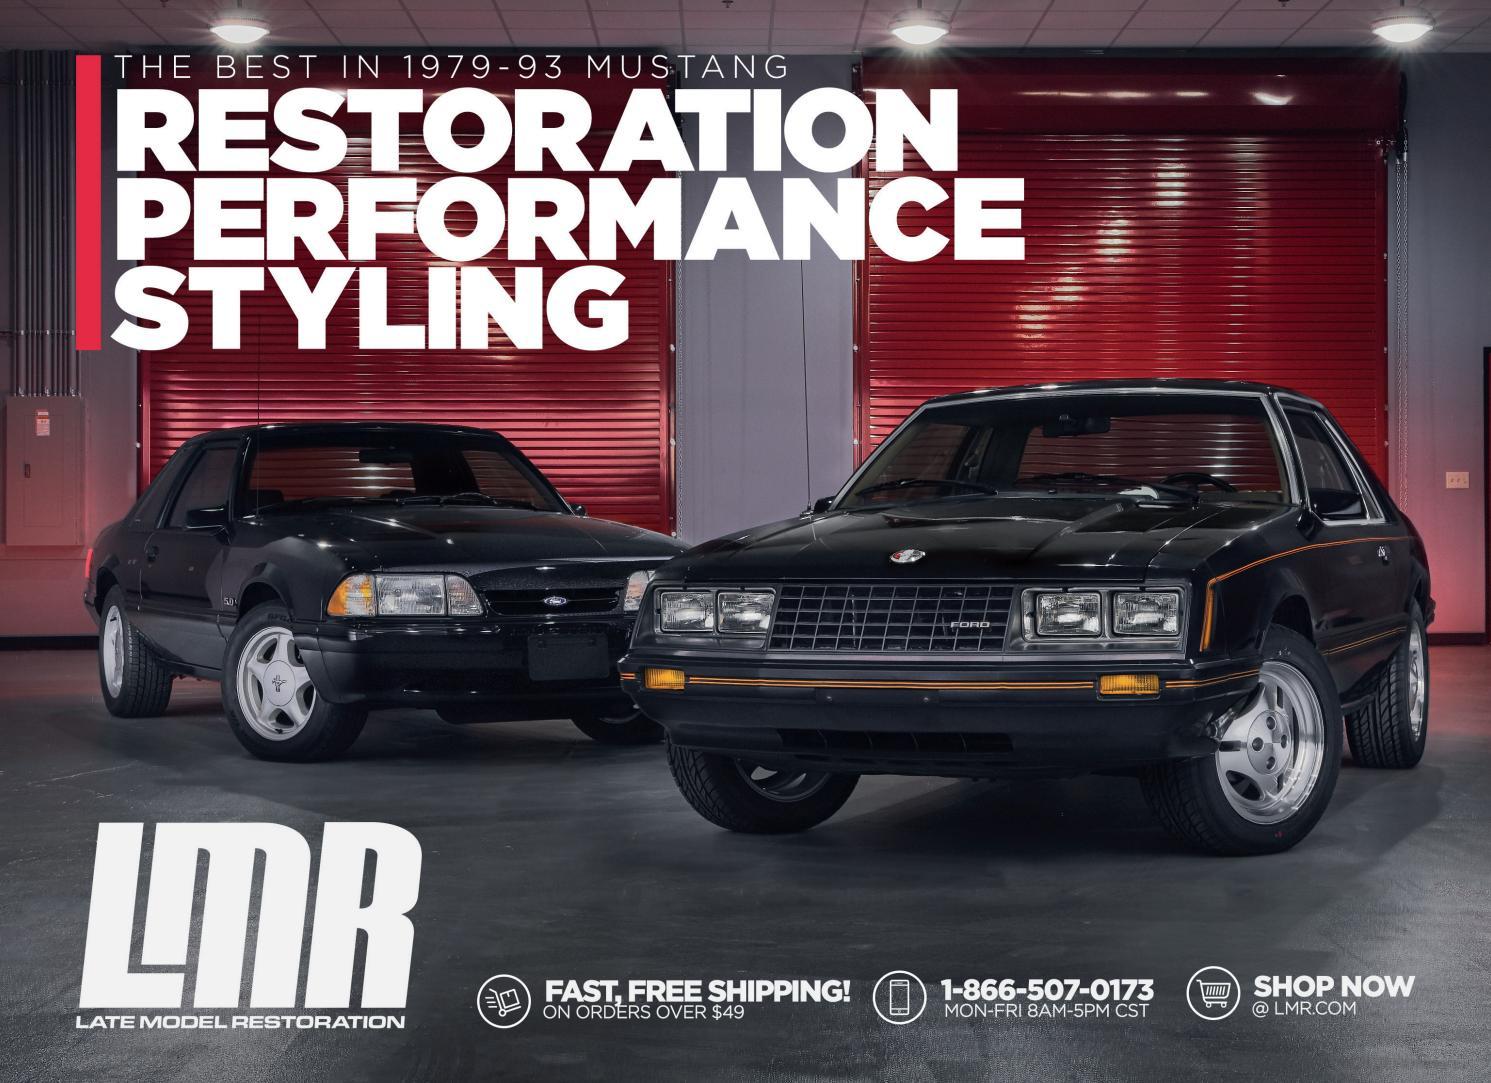 By Fox Restoration Model Body 93 Catalog Mustang 1979 Late kuiOXZPT